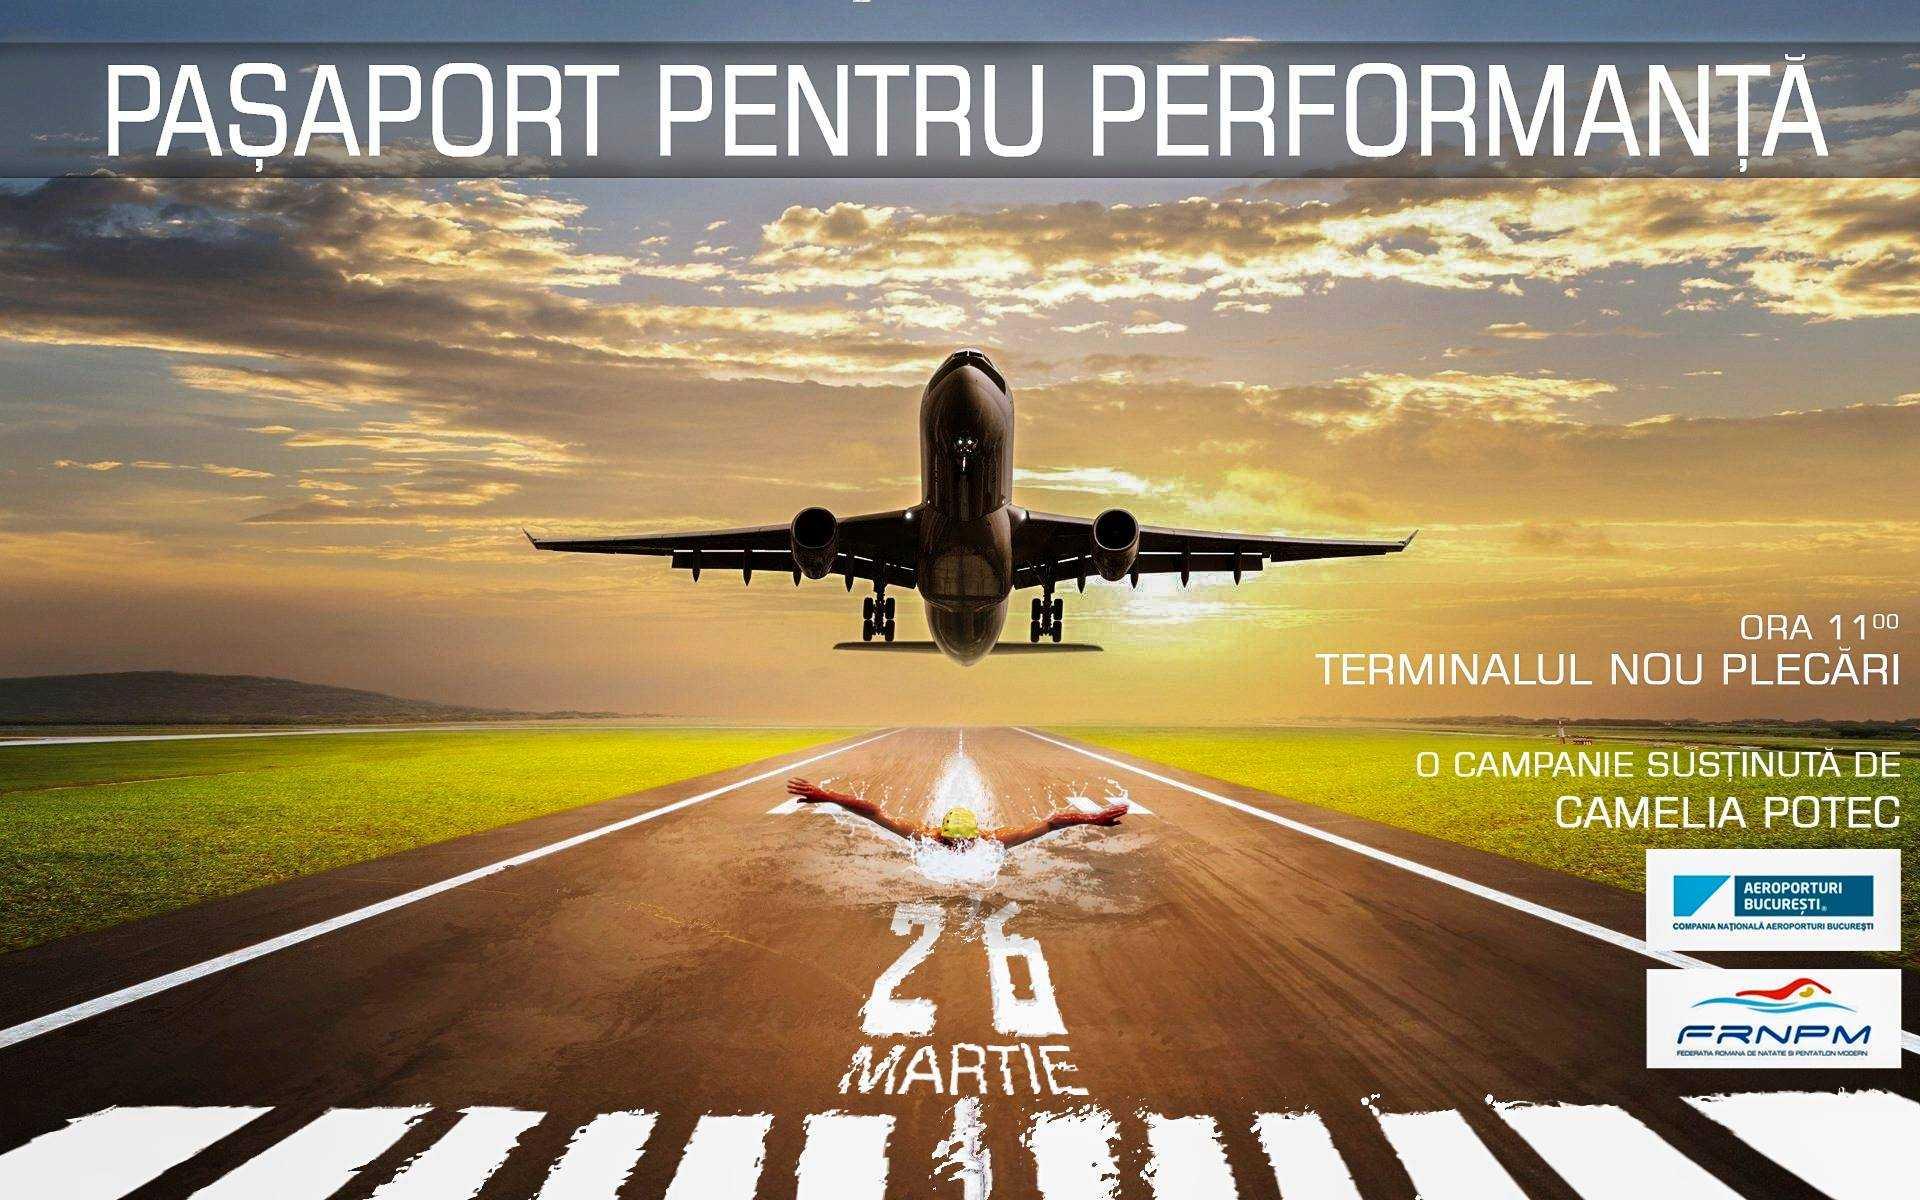 pasaport-pentru-performanta